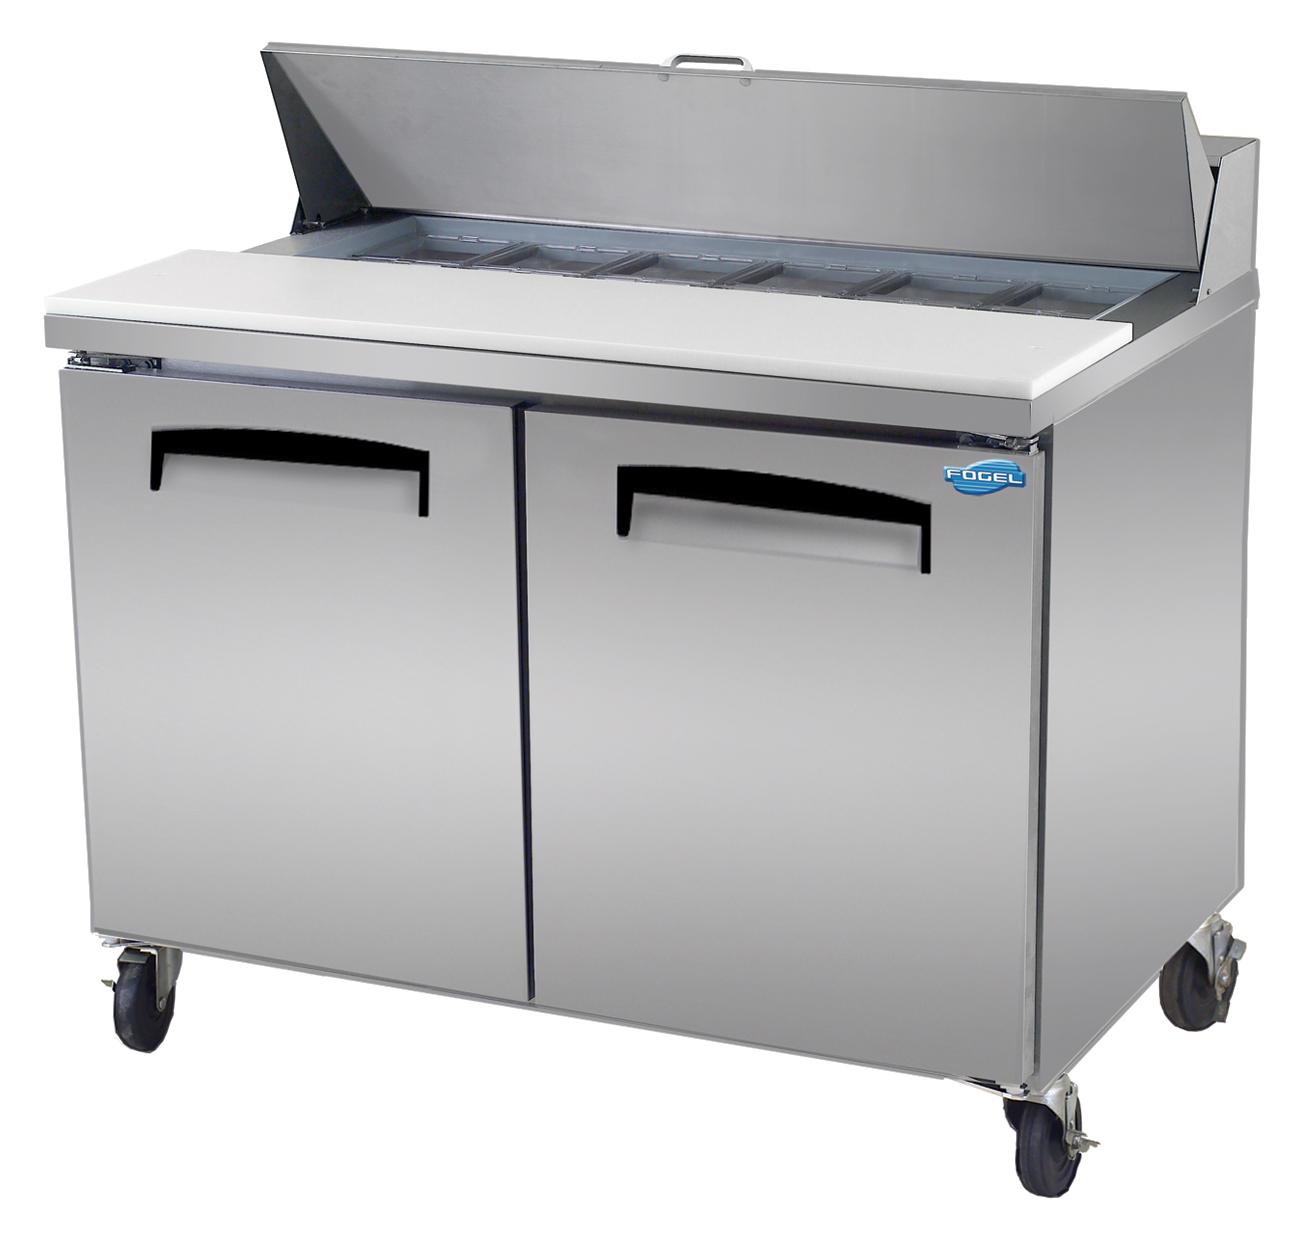 Fogel USA SFLP-45-18 refrigerated counter, mega top sandwich / salad unit